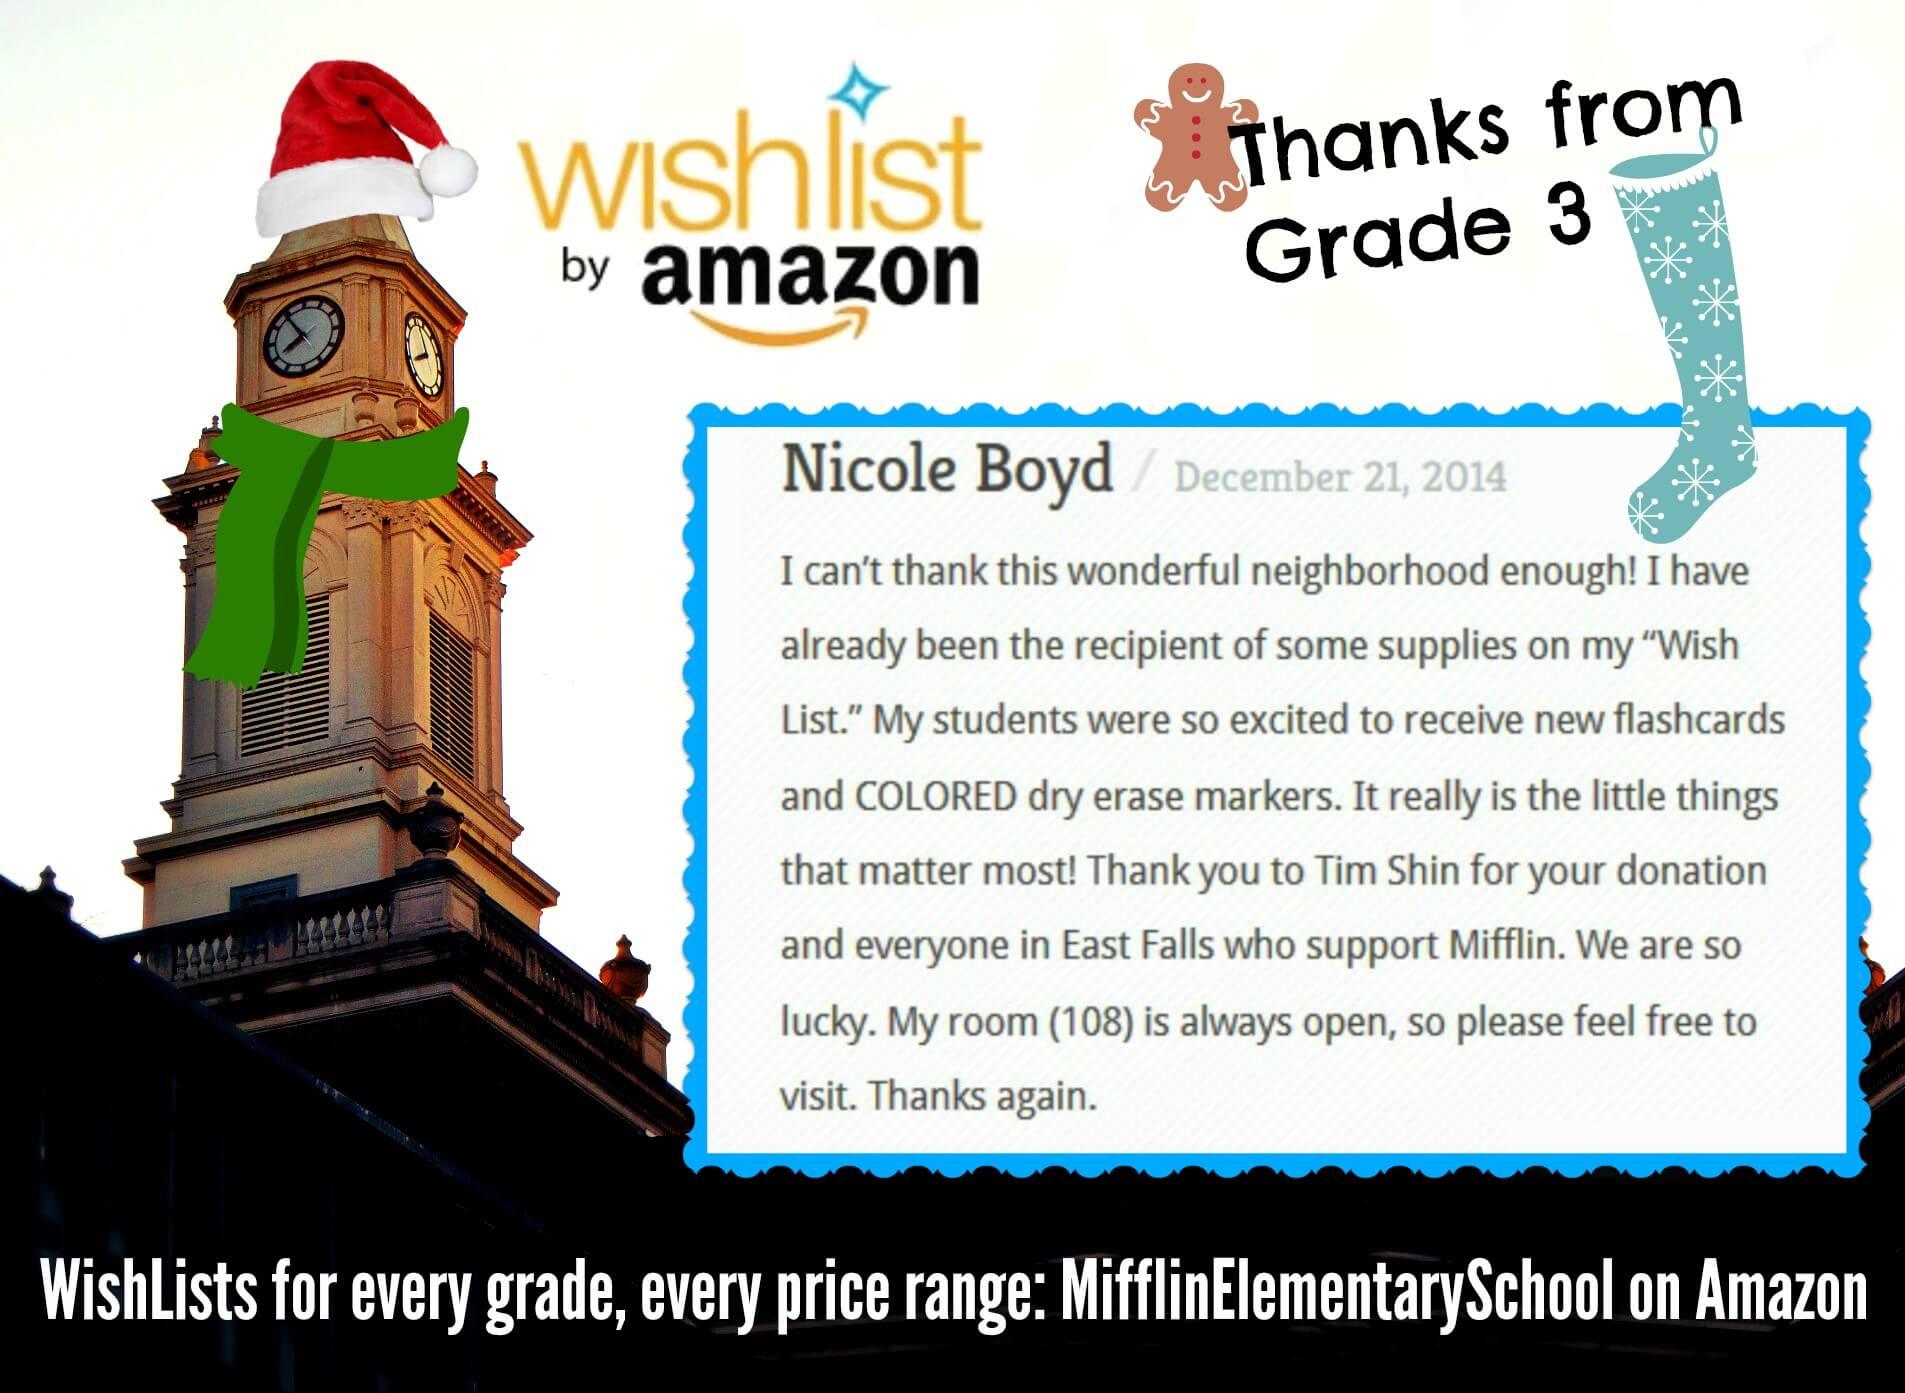 EastFallsLocal Nicole Boyd thank you to Tim Shin